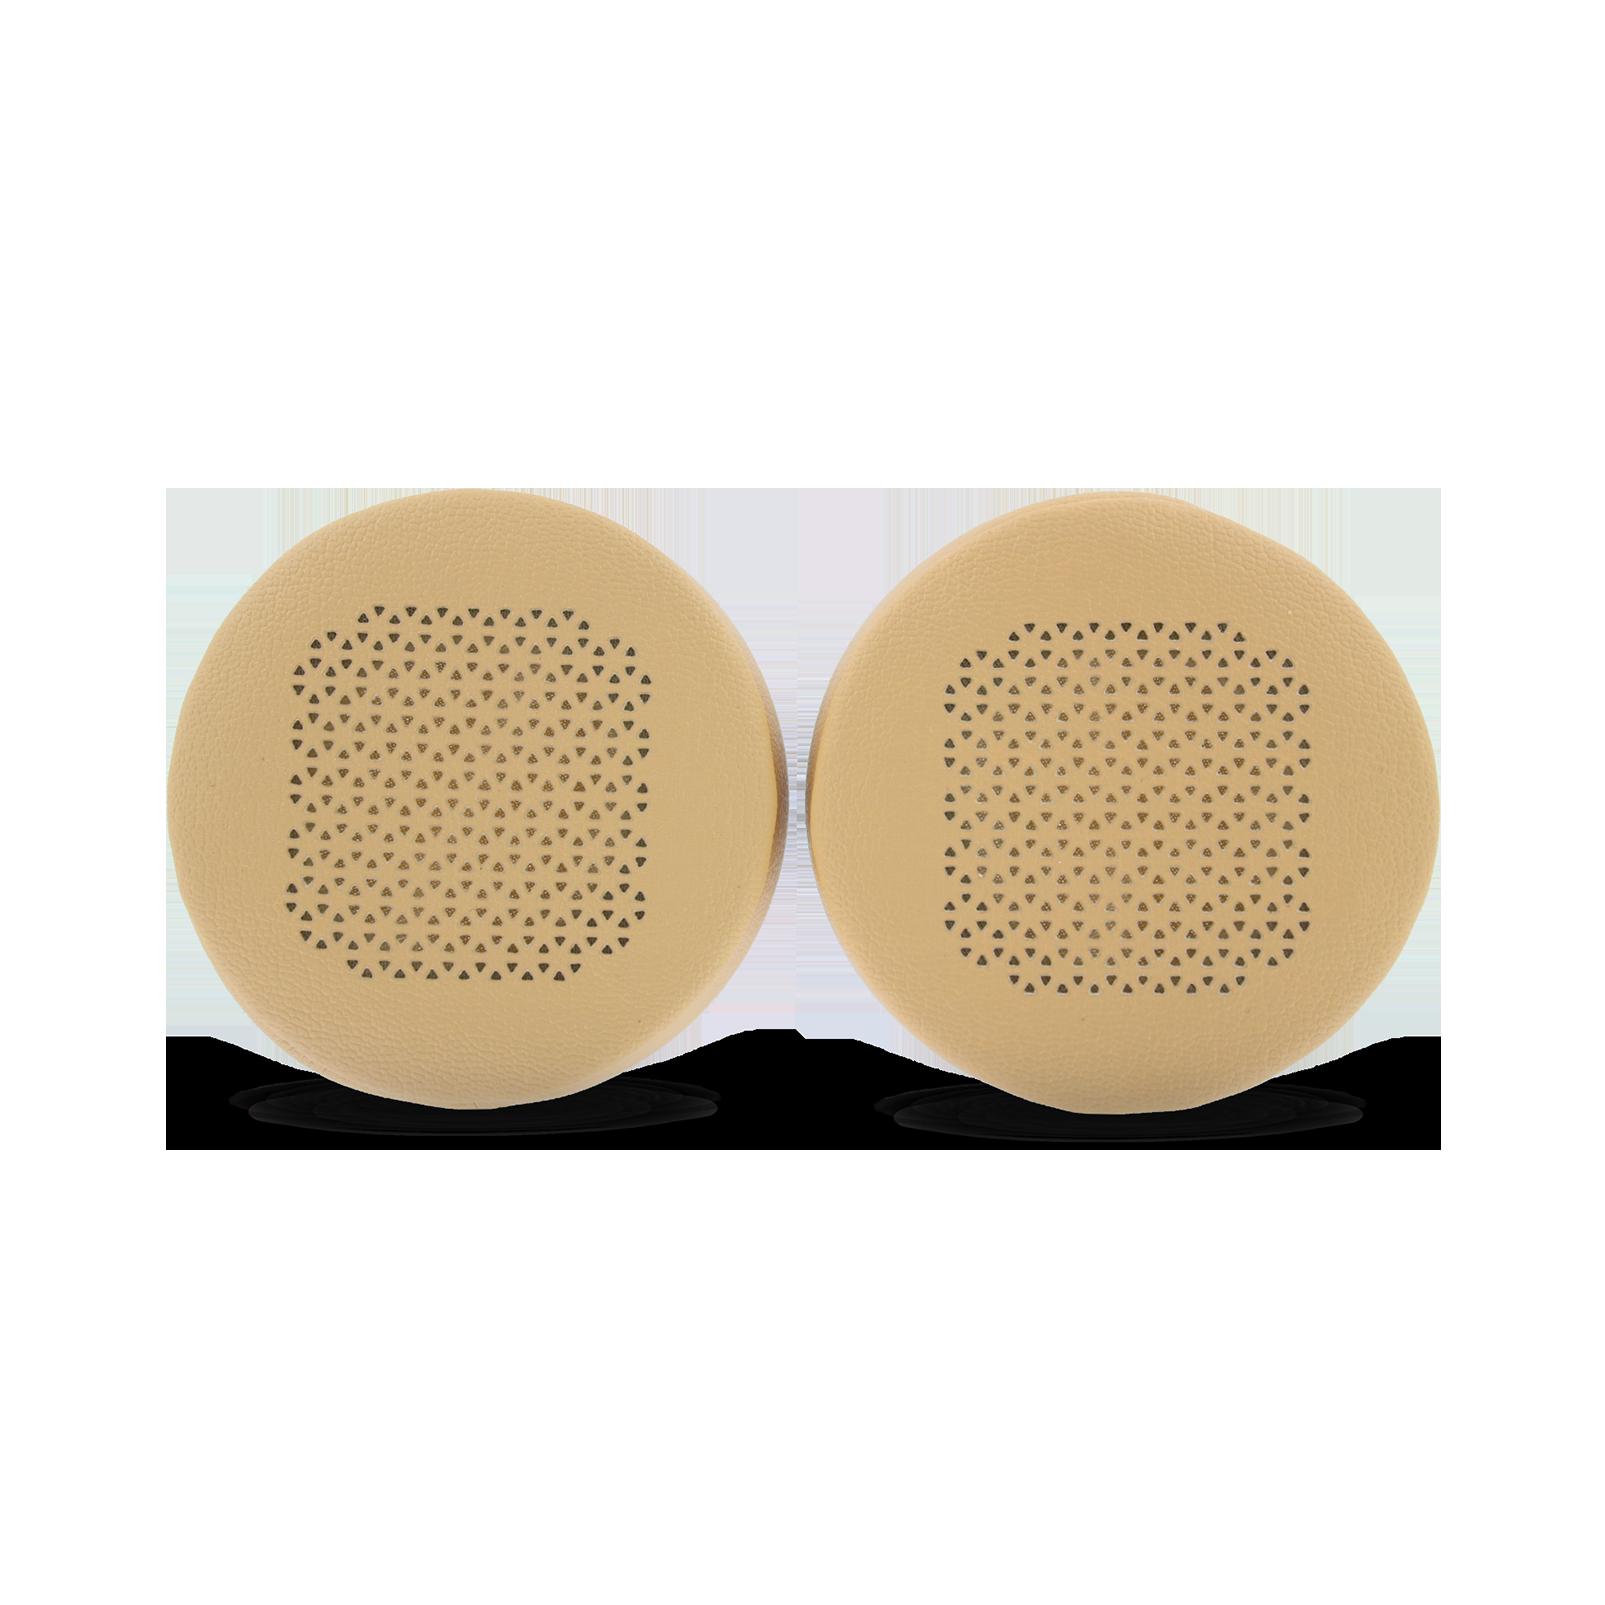 JBL Ear pads for Duet - Grey - Ear pads (L+R) - Hero